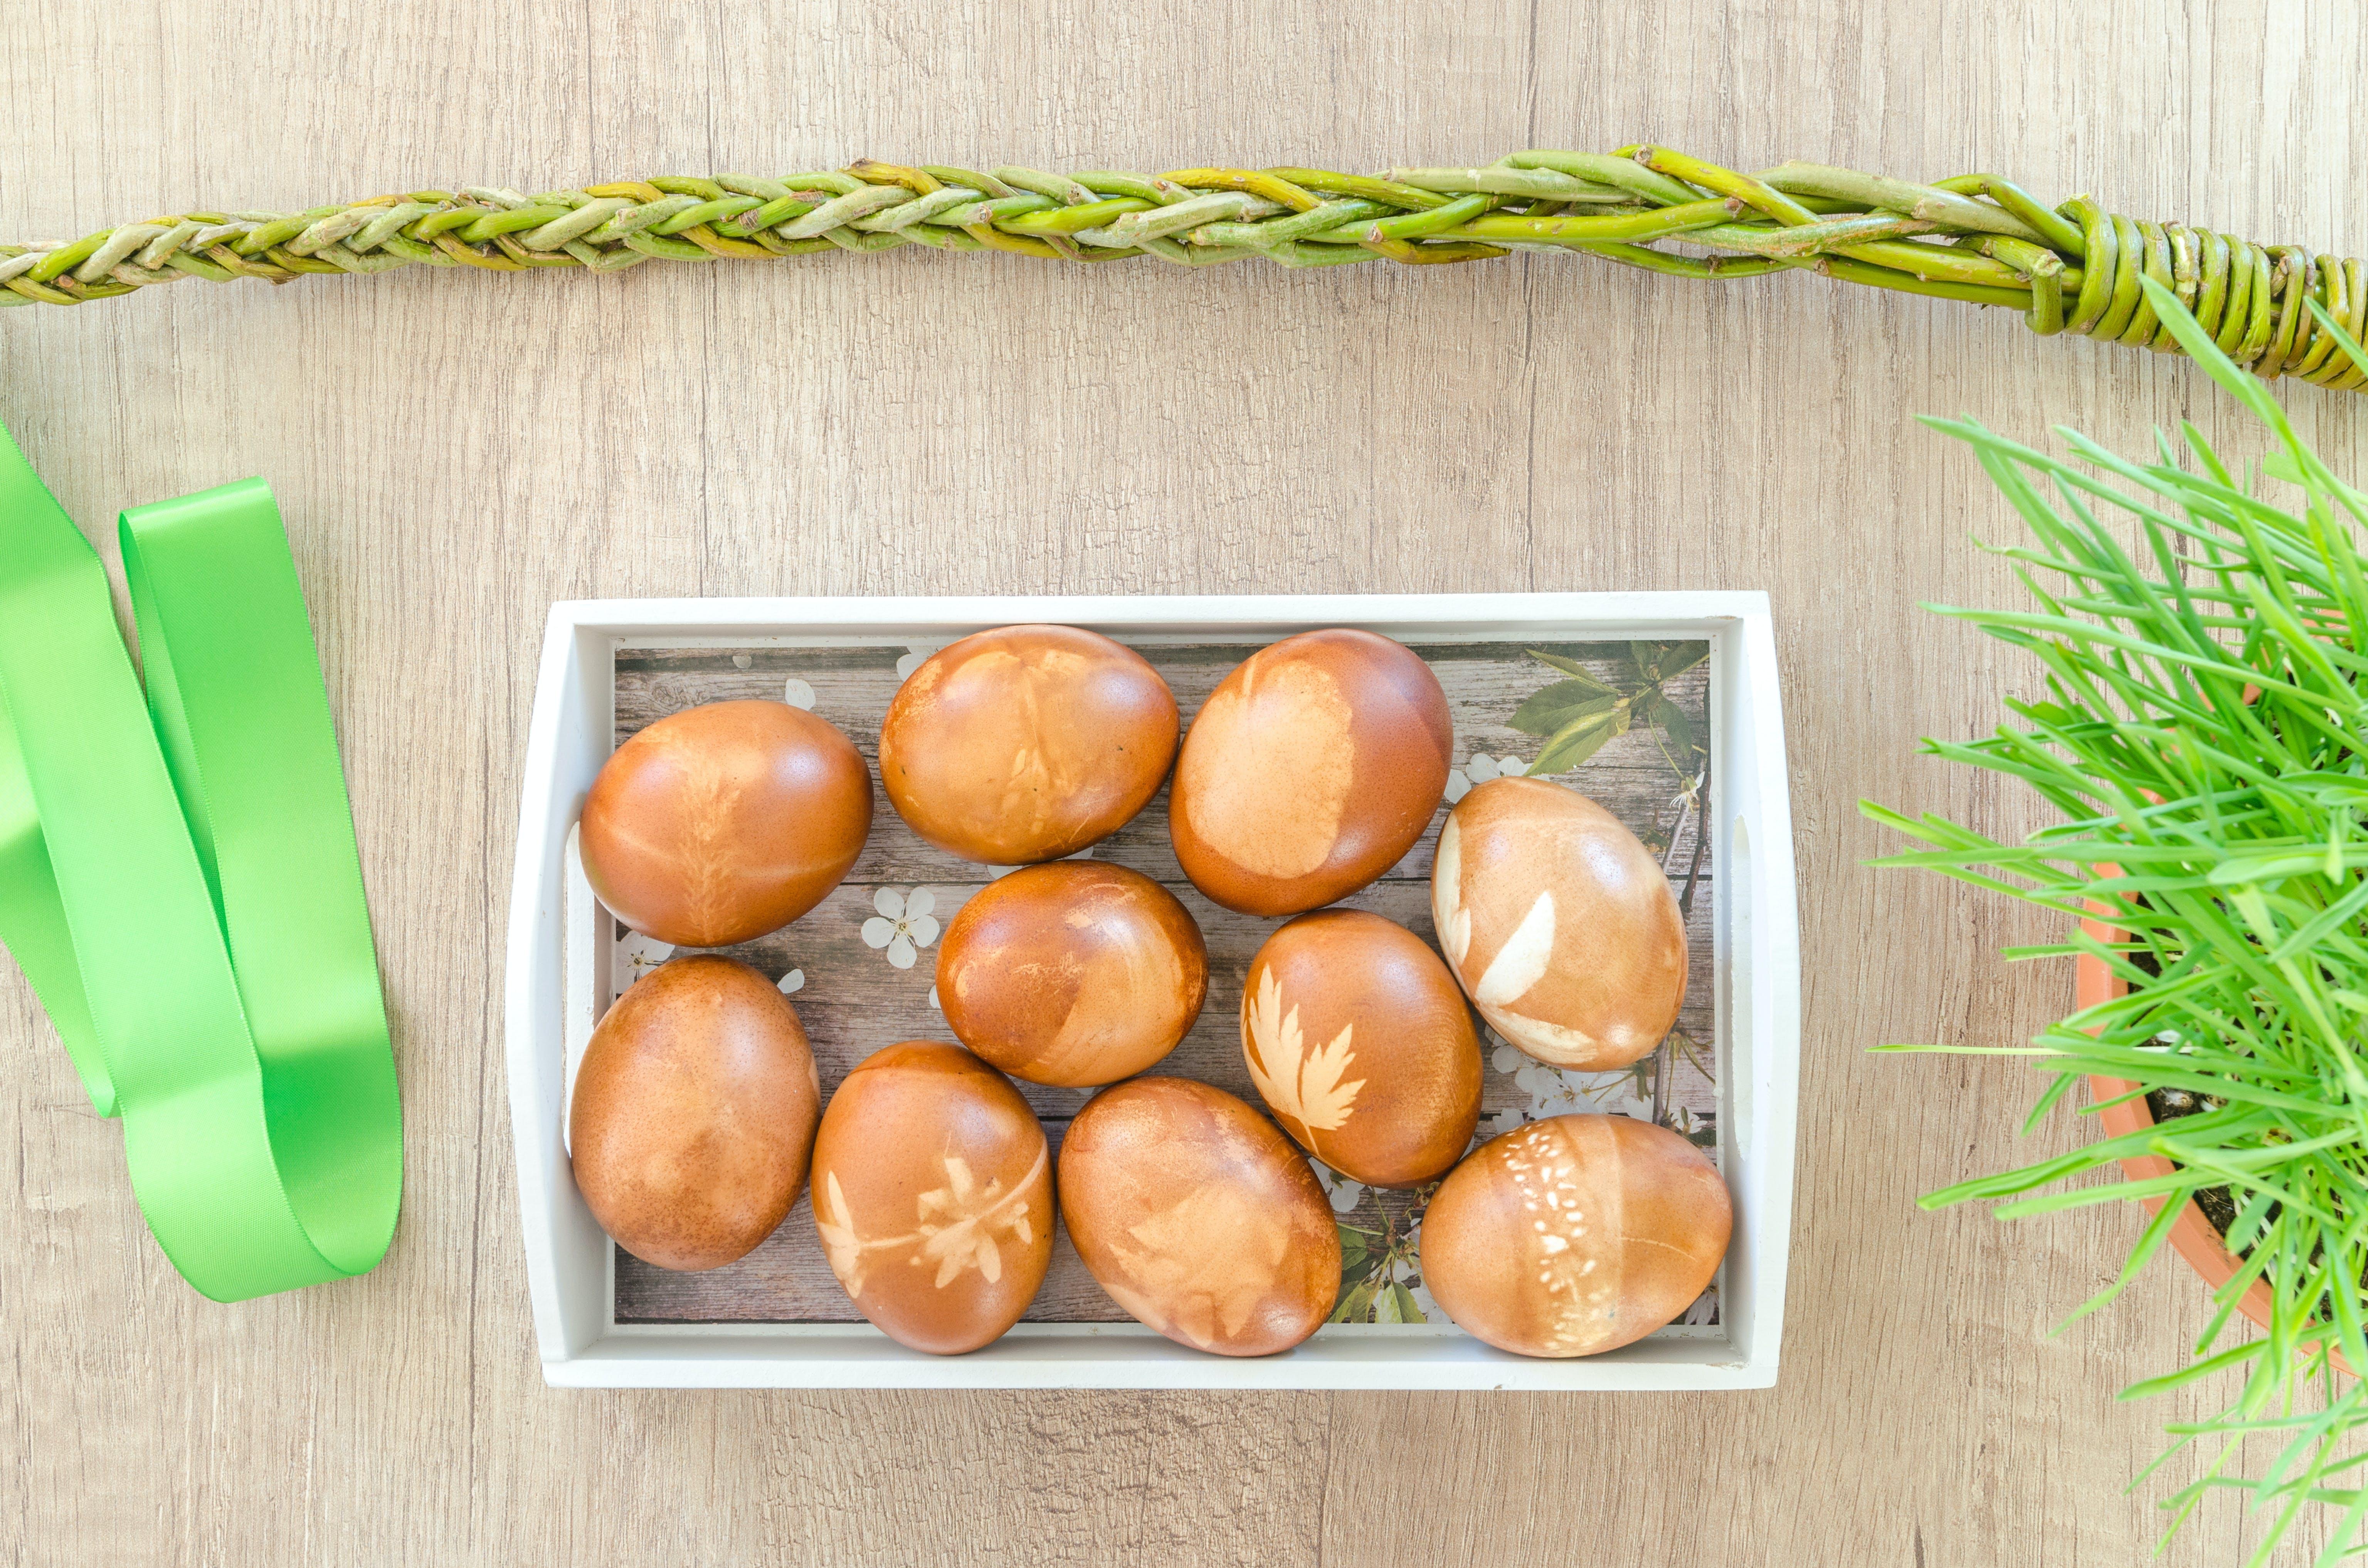 Egg on Top of White Wooden Basket